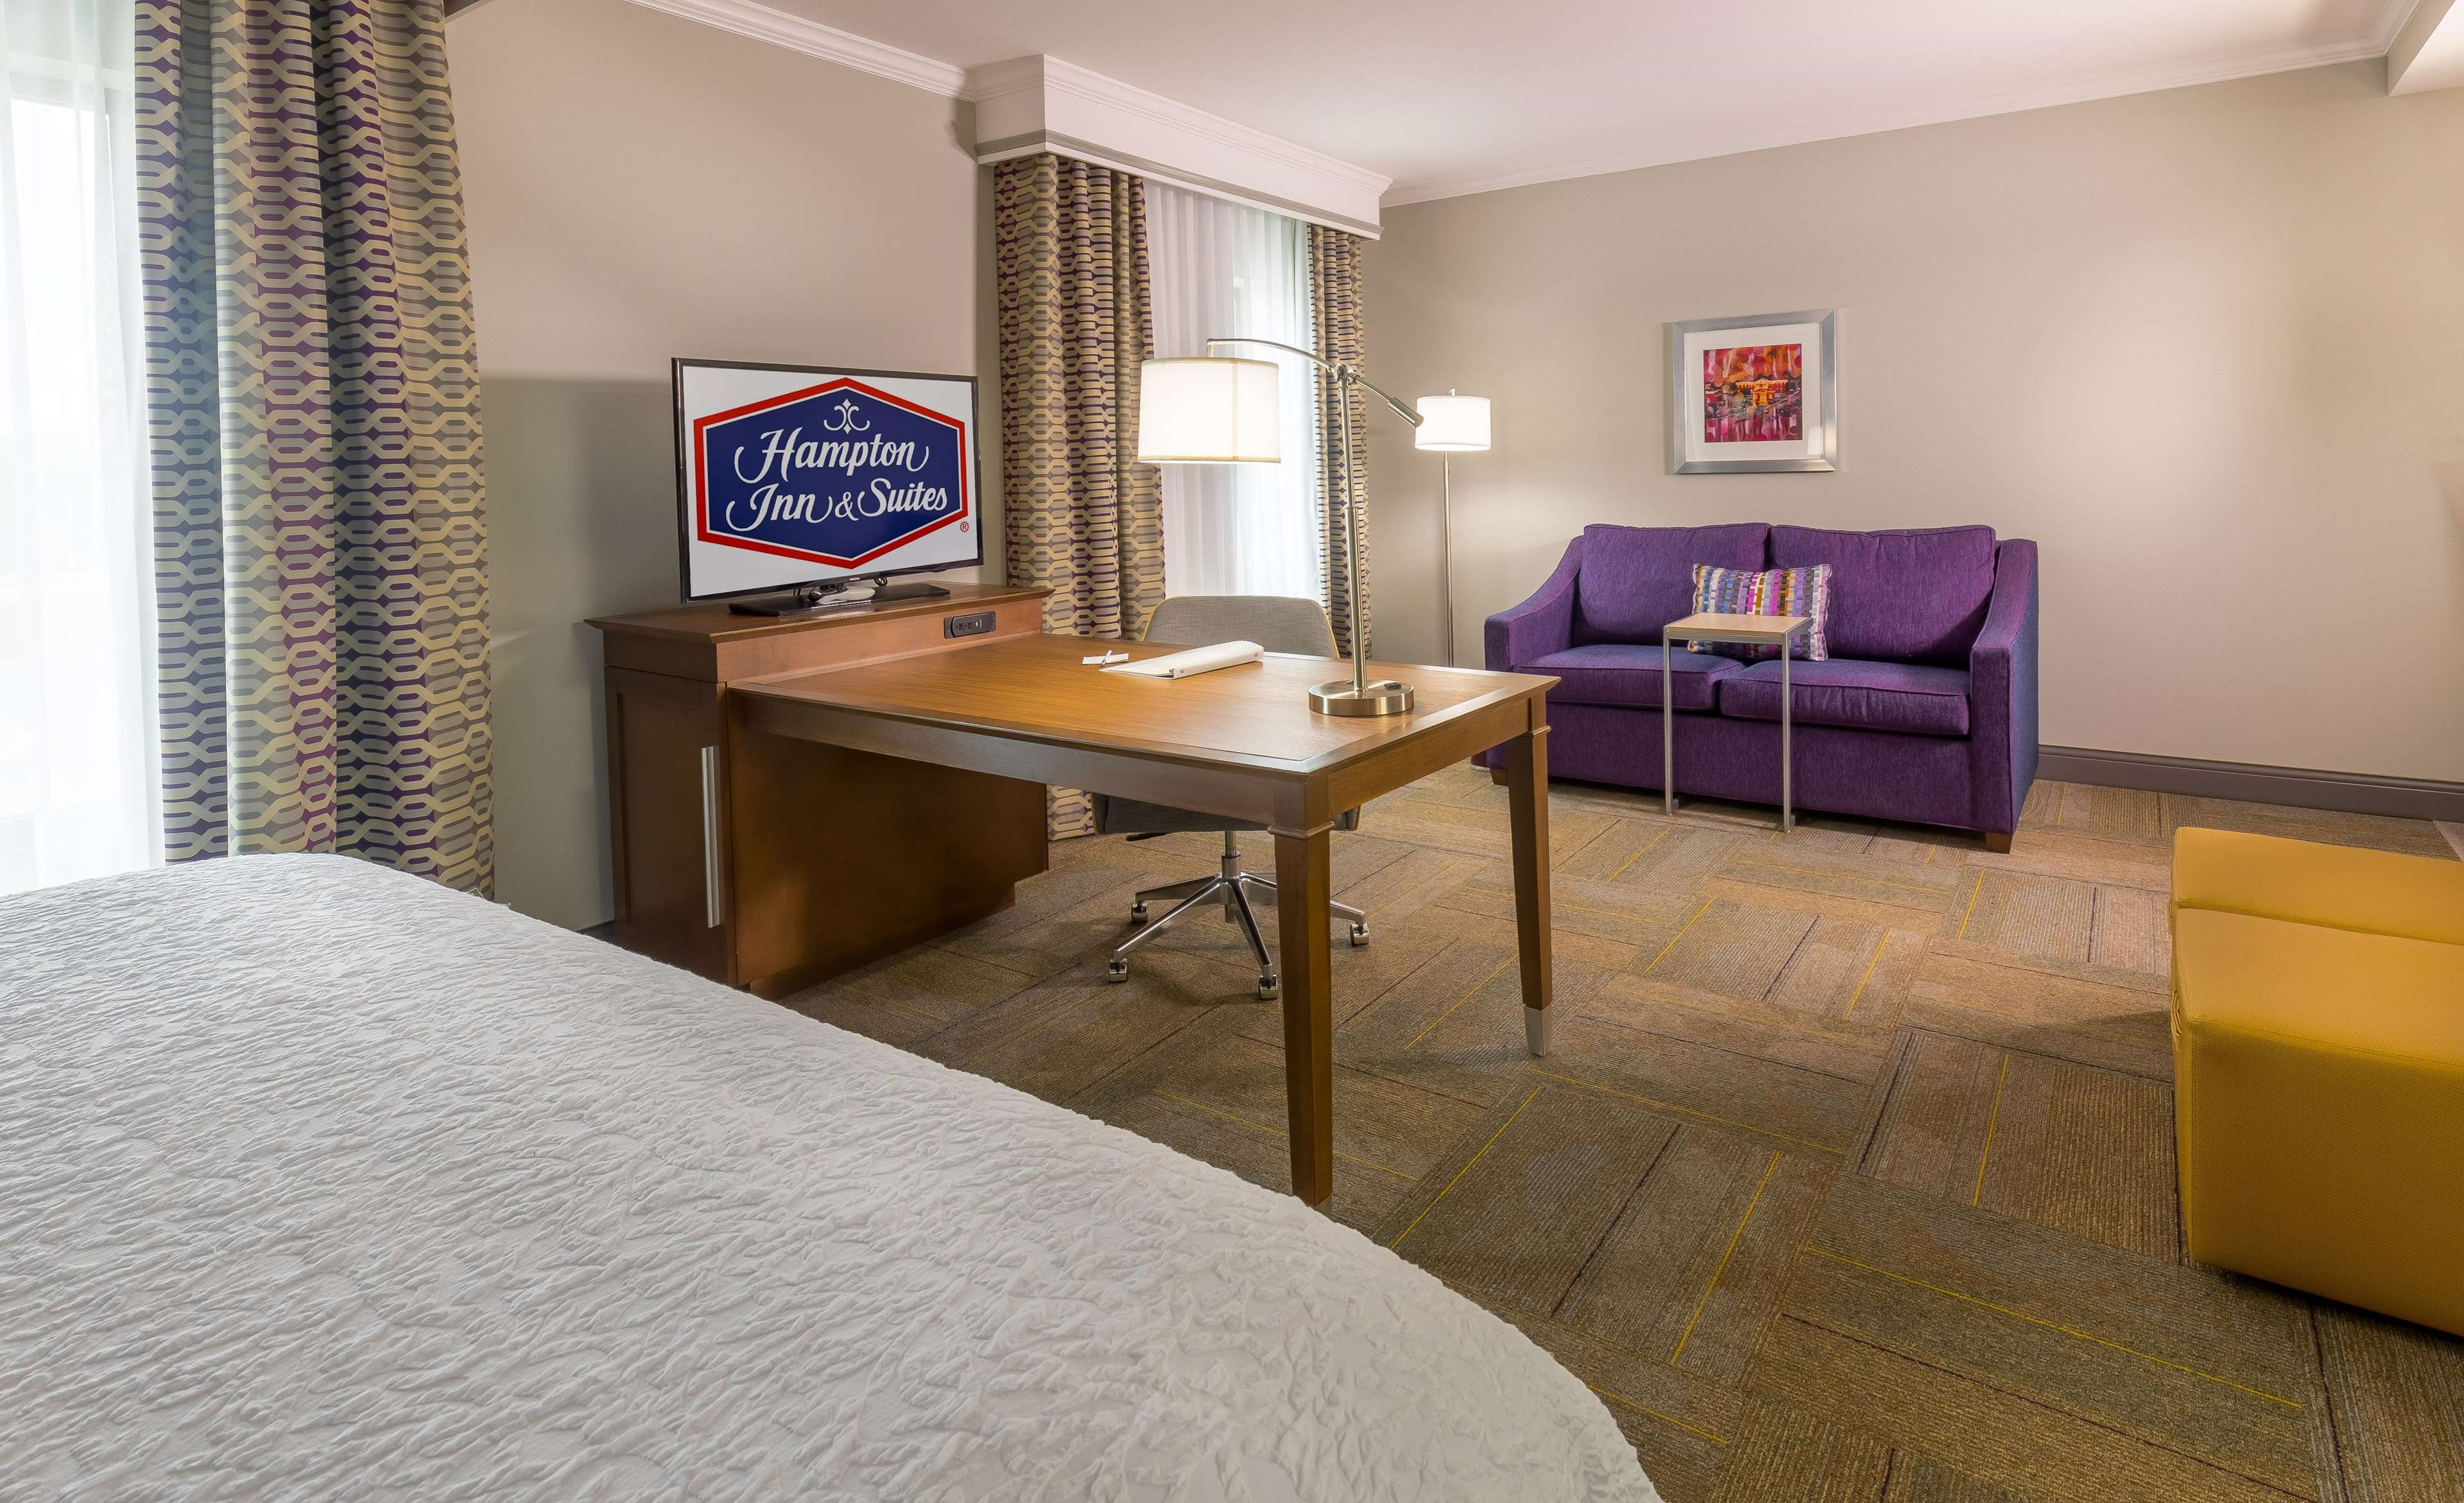 Hampton Inn & Suites Dublin image 2